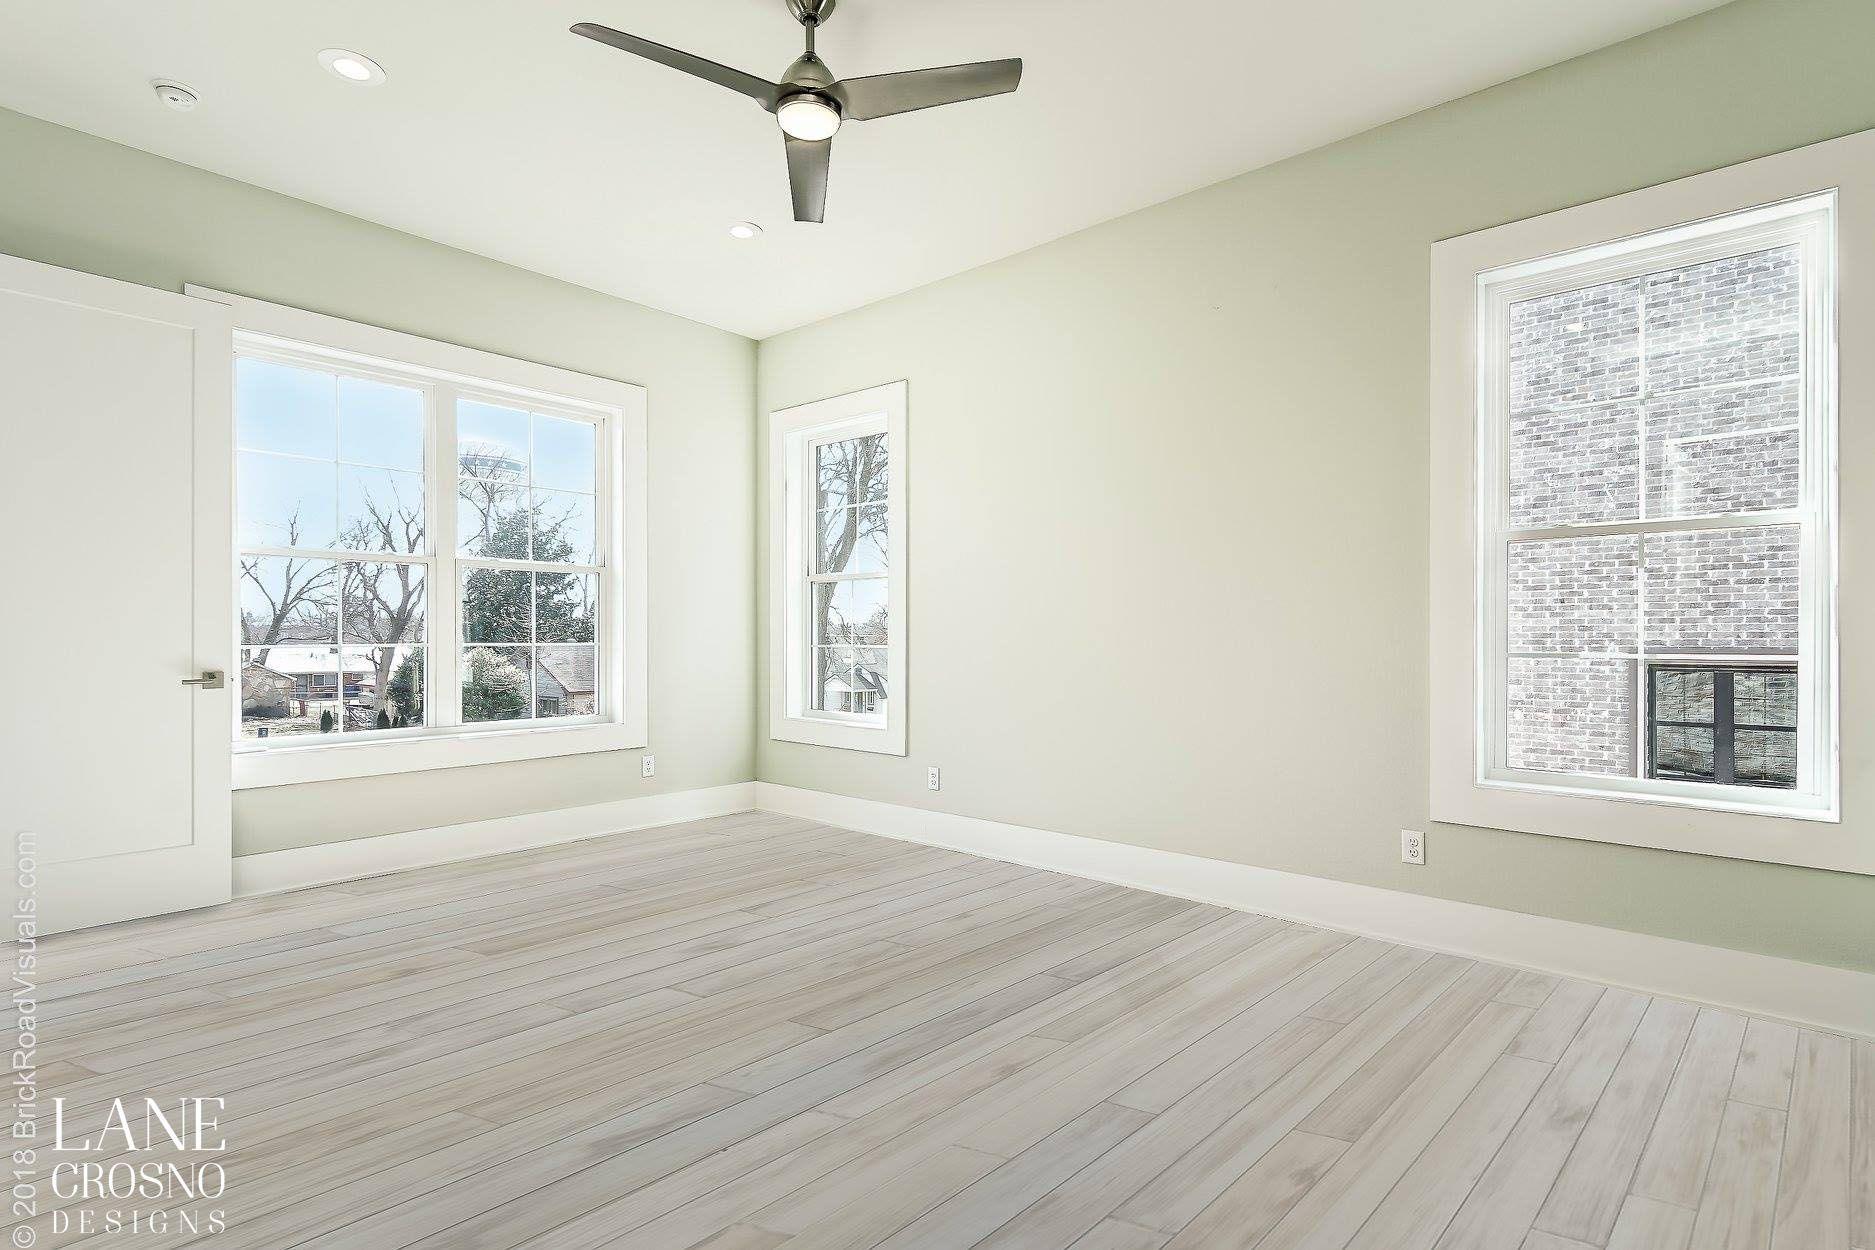 Master Bedroom With Wood Look Tile Floors Natural Light Lots Of Windows Gray Walls Modern Fan Wood Look Tile Floor House Design Wood Look Tile